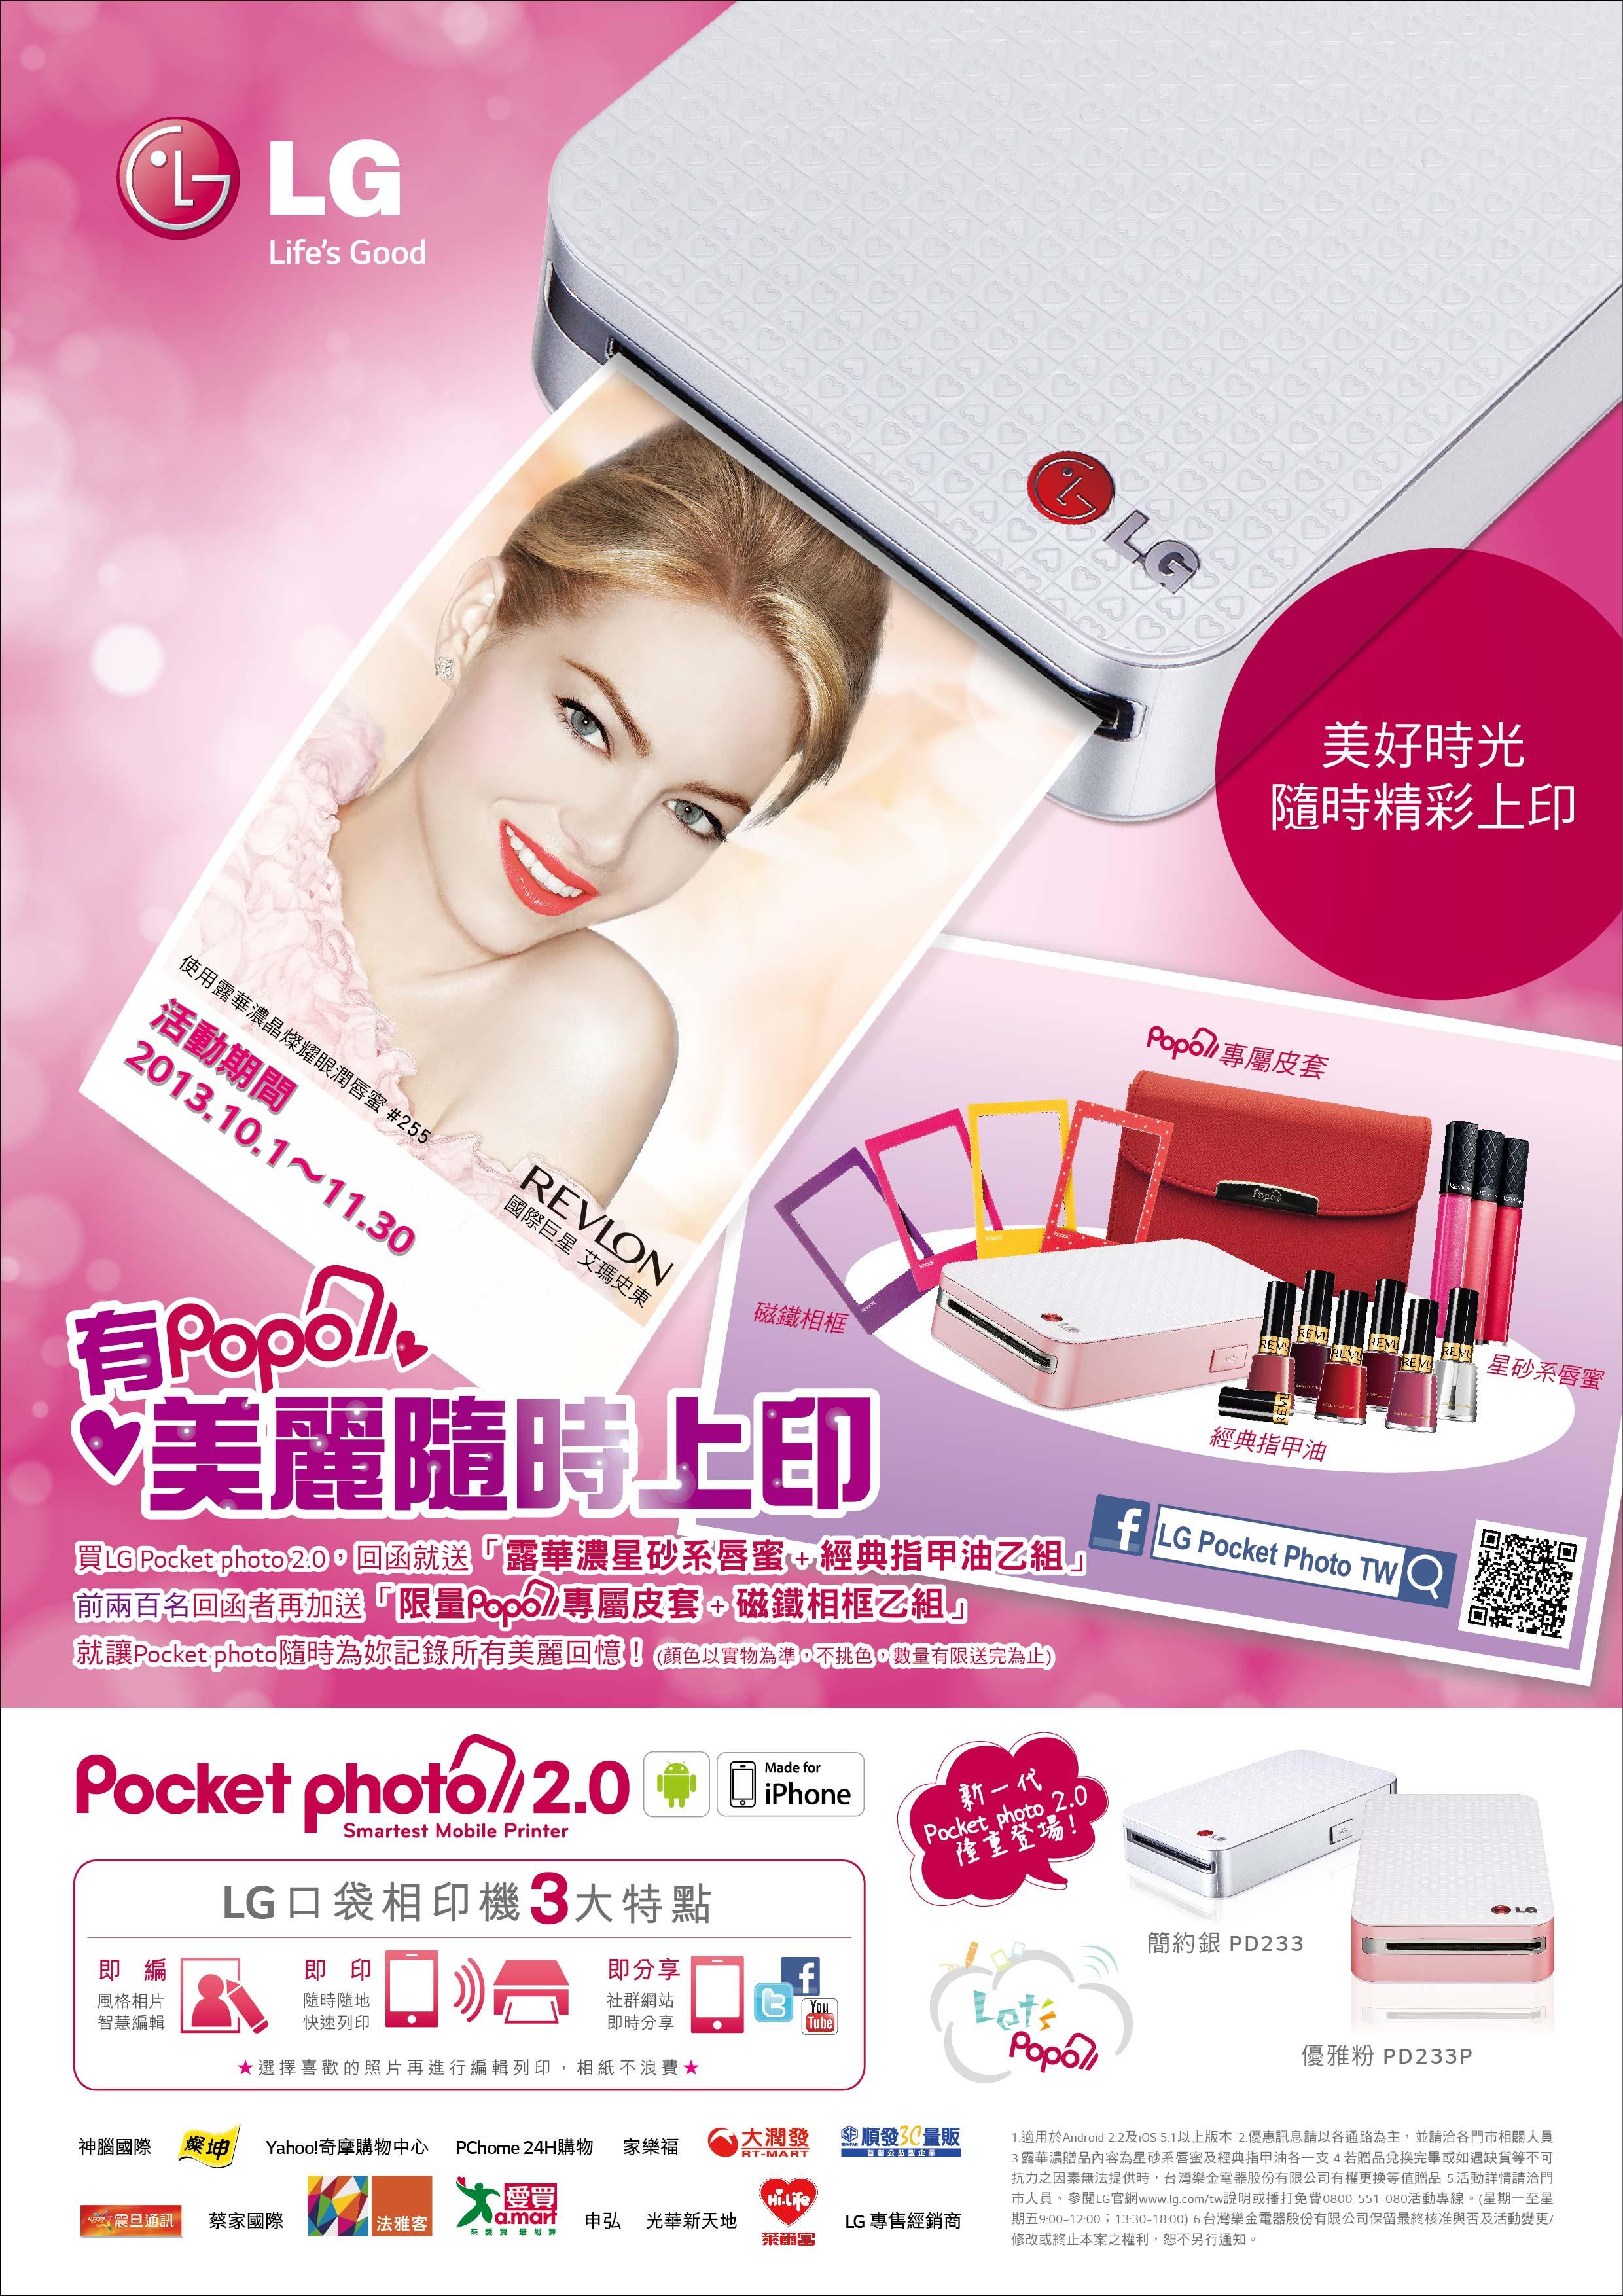 0912【LG】Pocket photo & REVLON - KV